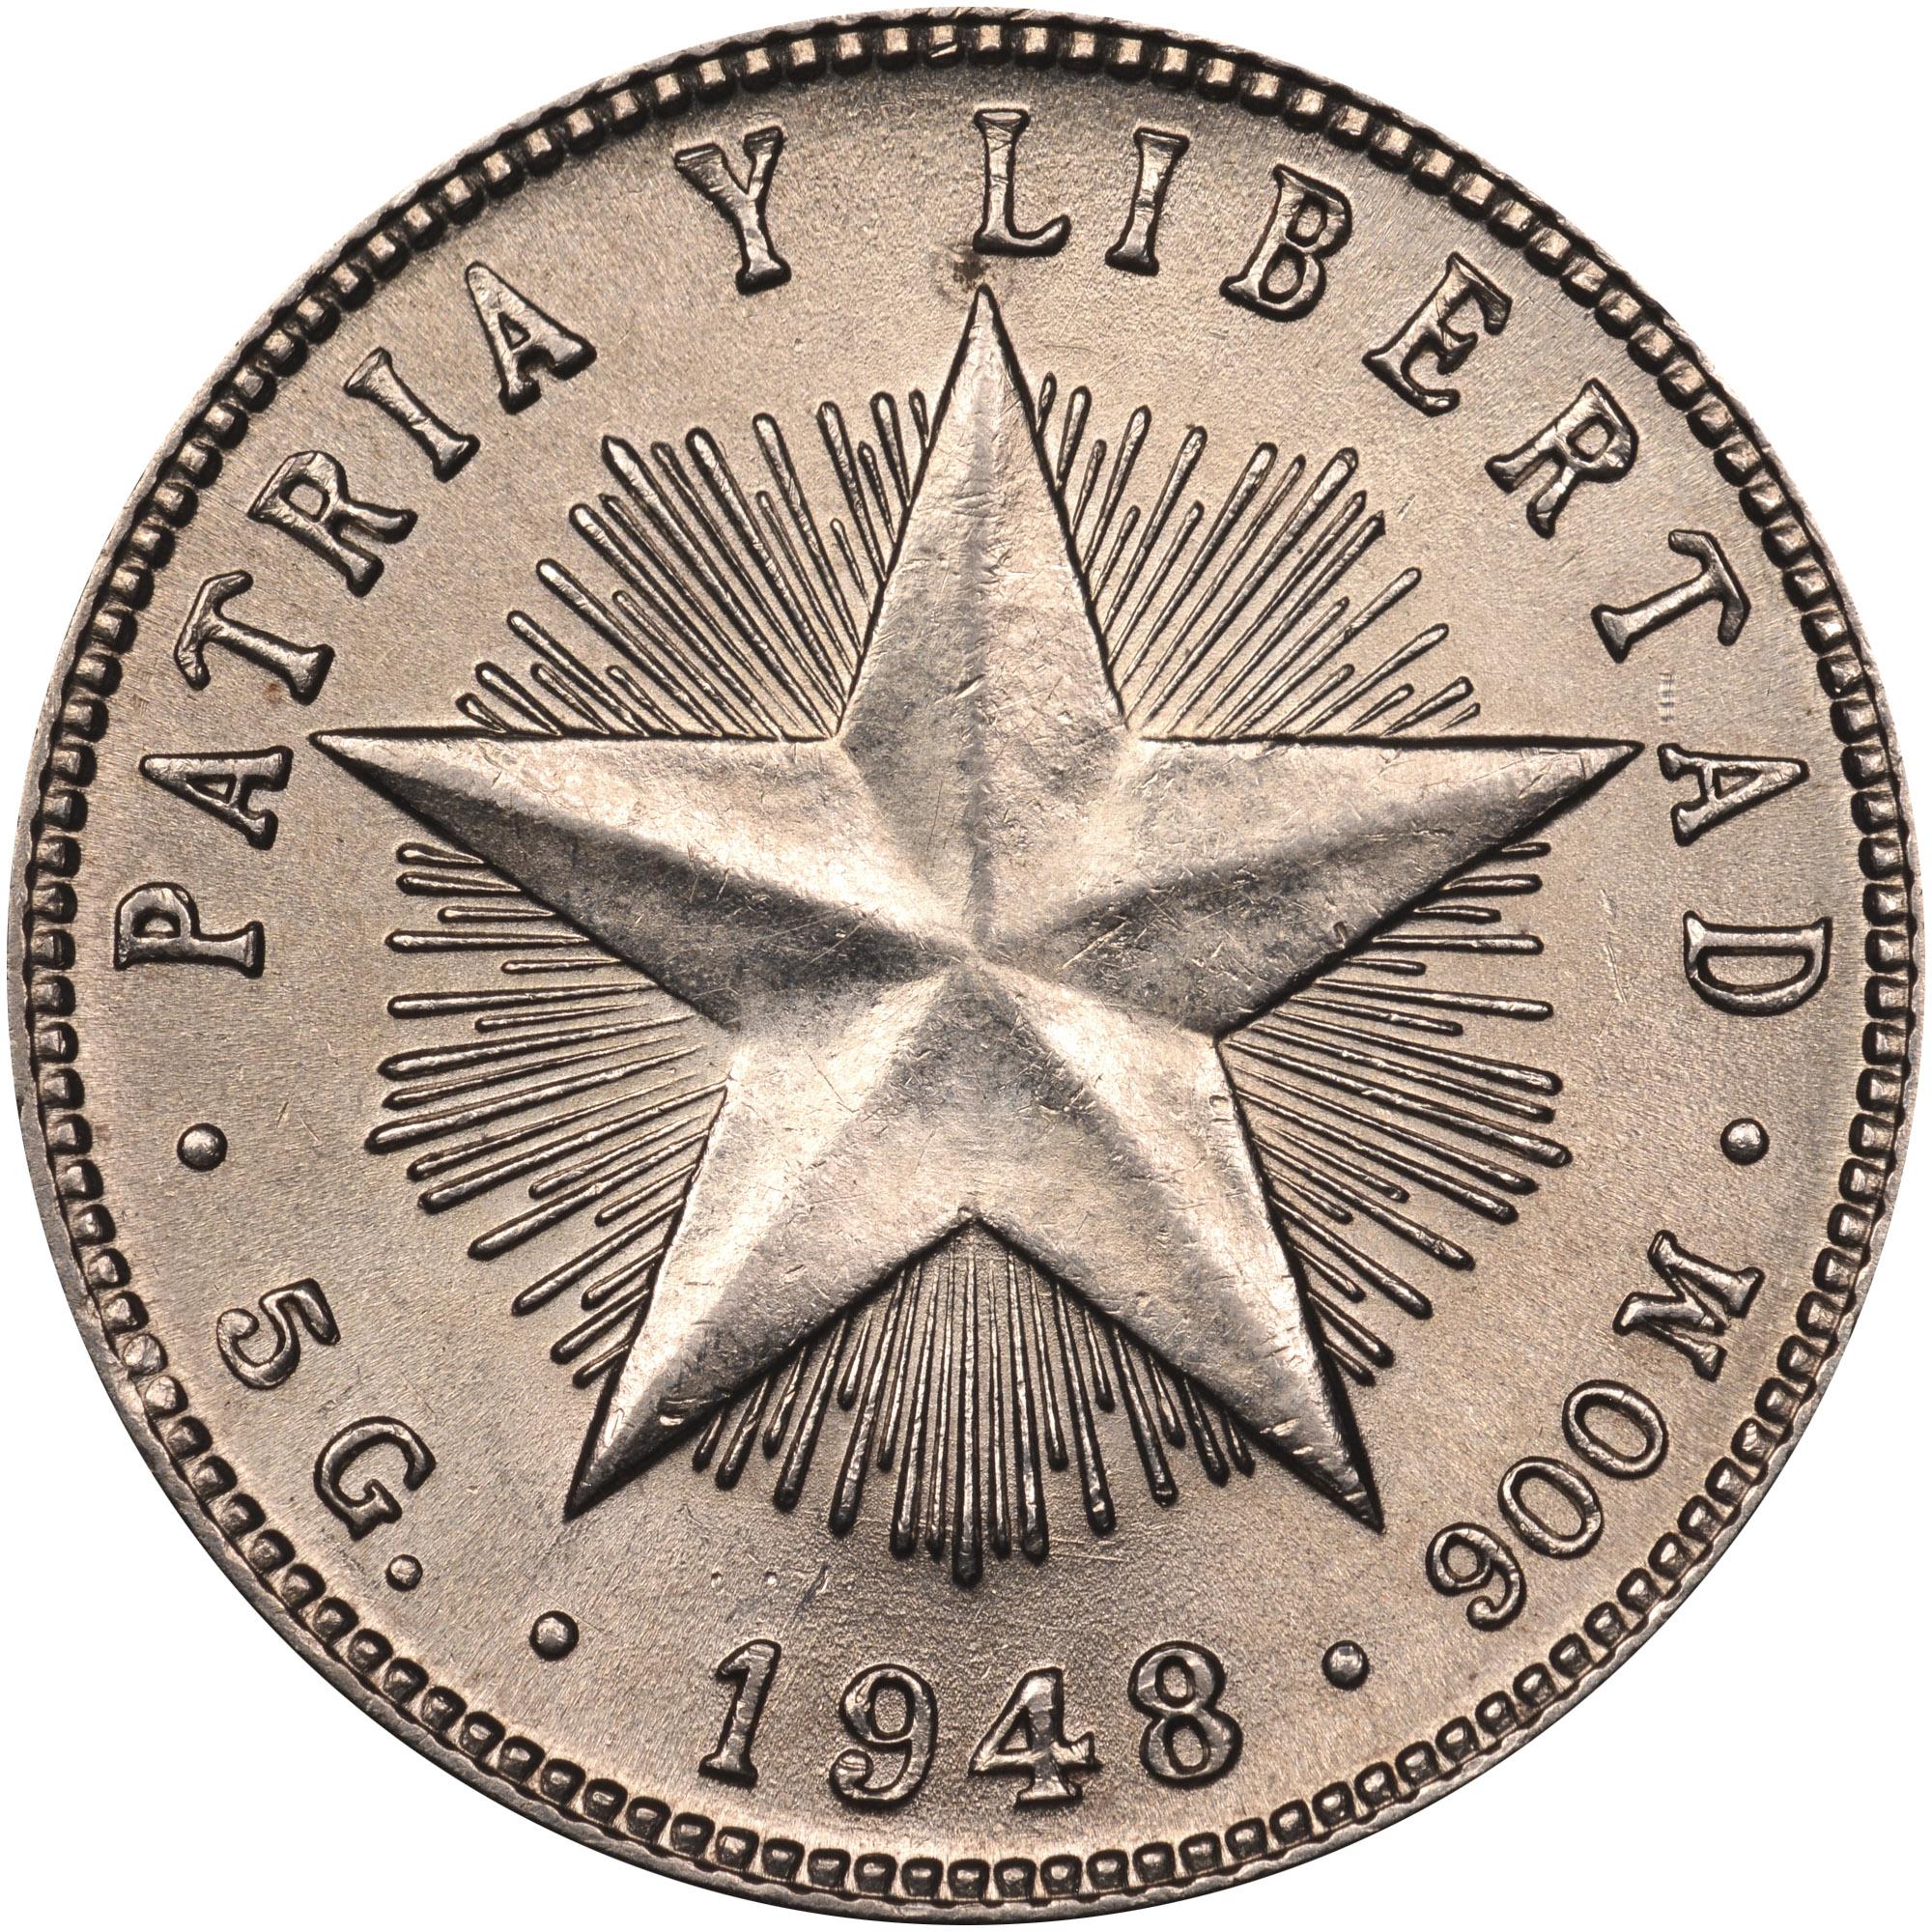 Star coin world 7 ghost house key west : Sphtx coin address